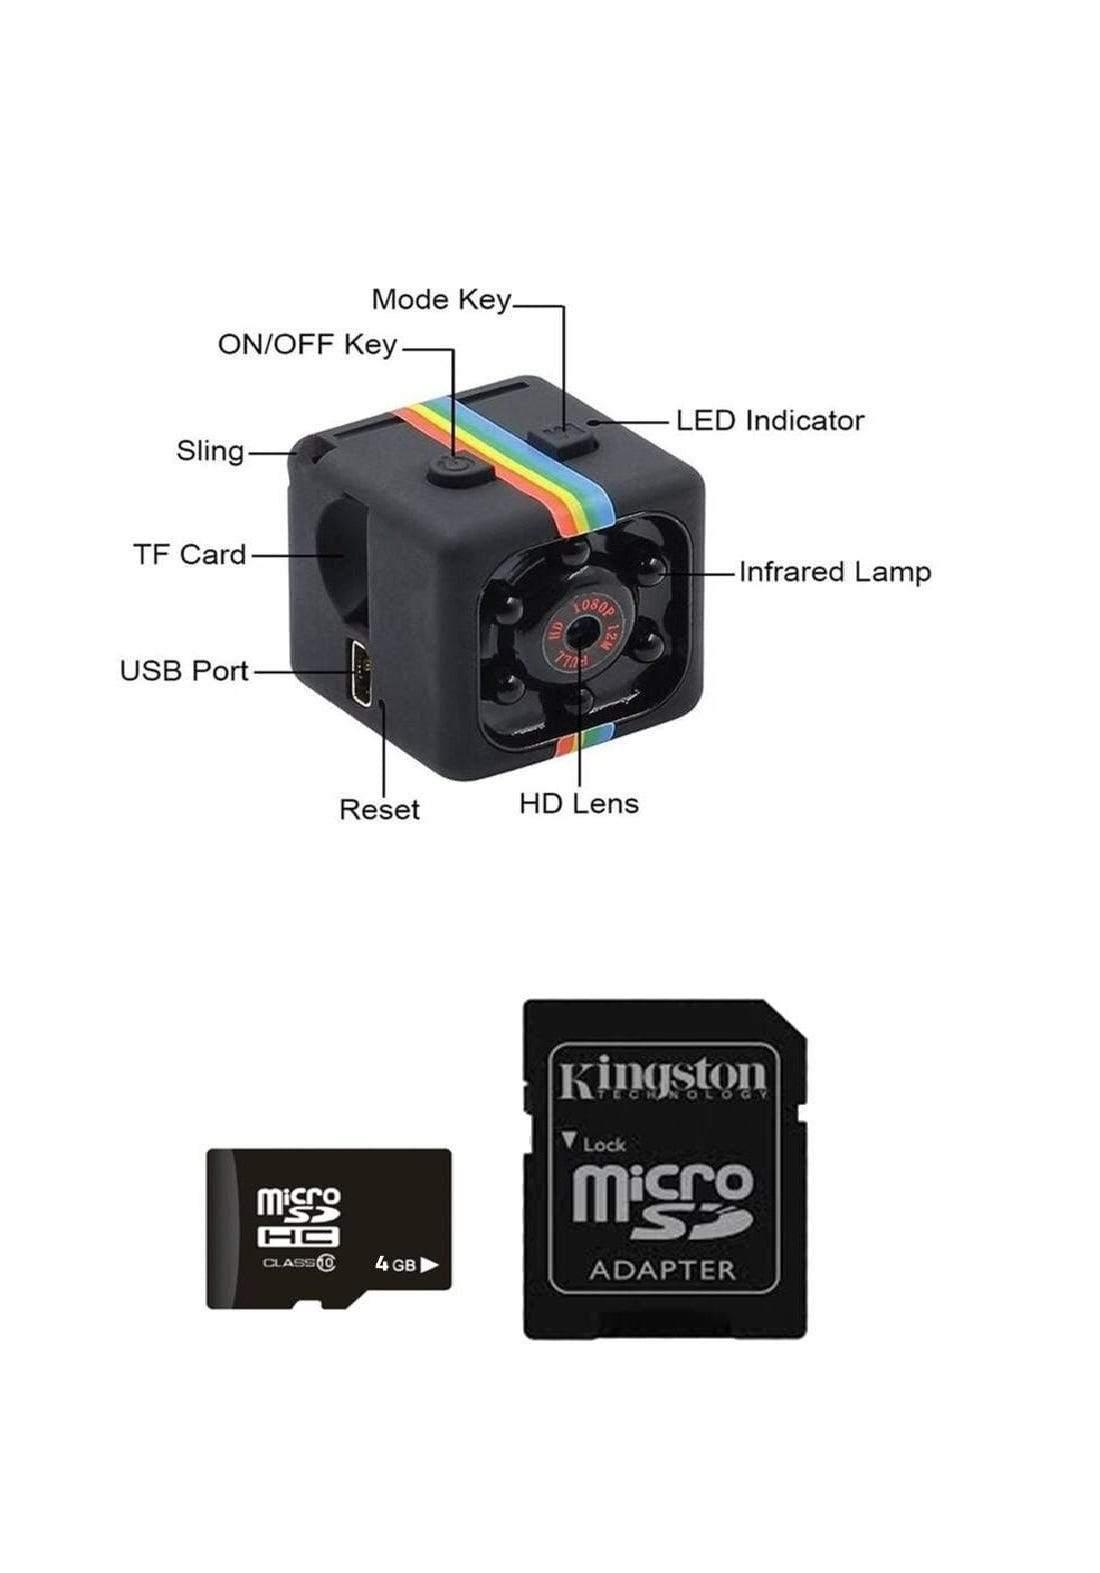 Ocamo SQ11 Mini Camera 1080P HD and  Flash Memory Card SDC4/4GB - Black كاميرا صغيرة الحجم و فلاش